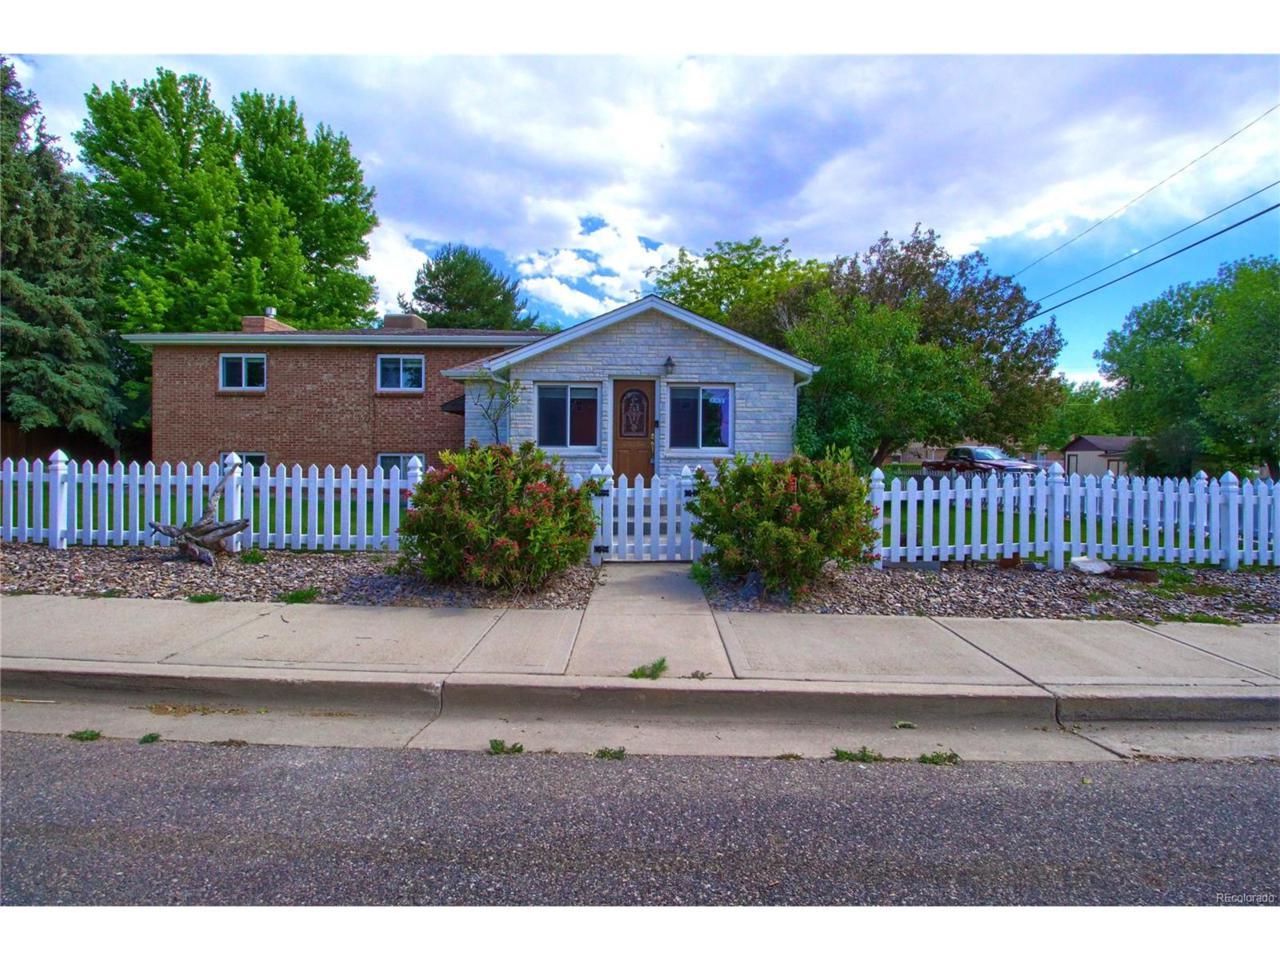 502 3rd Street, Frederick, CO 80530 (MLS #9035877) :: 8z Real Estate